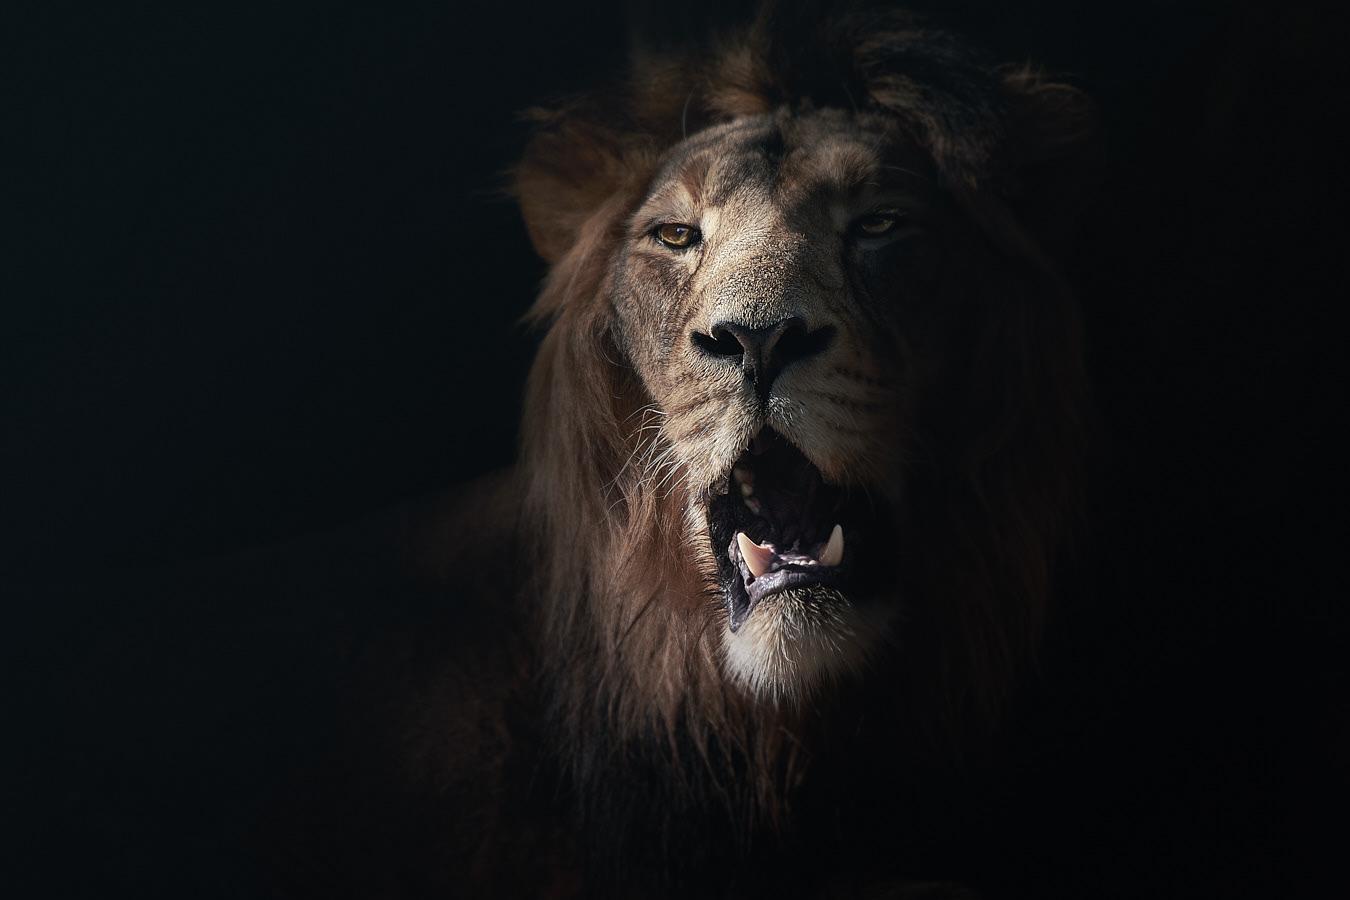 Mammals_ZOO / фотограф David Drbal